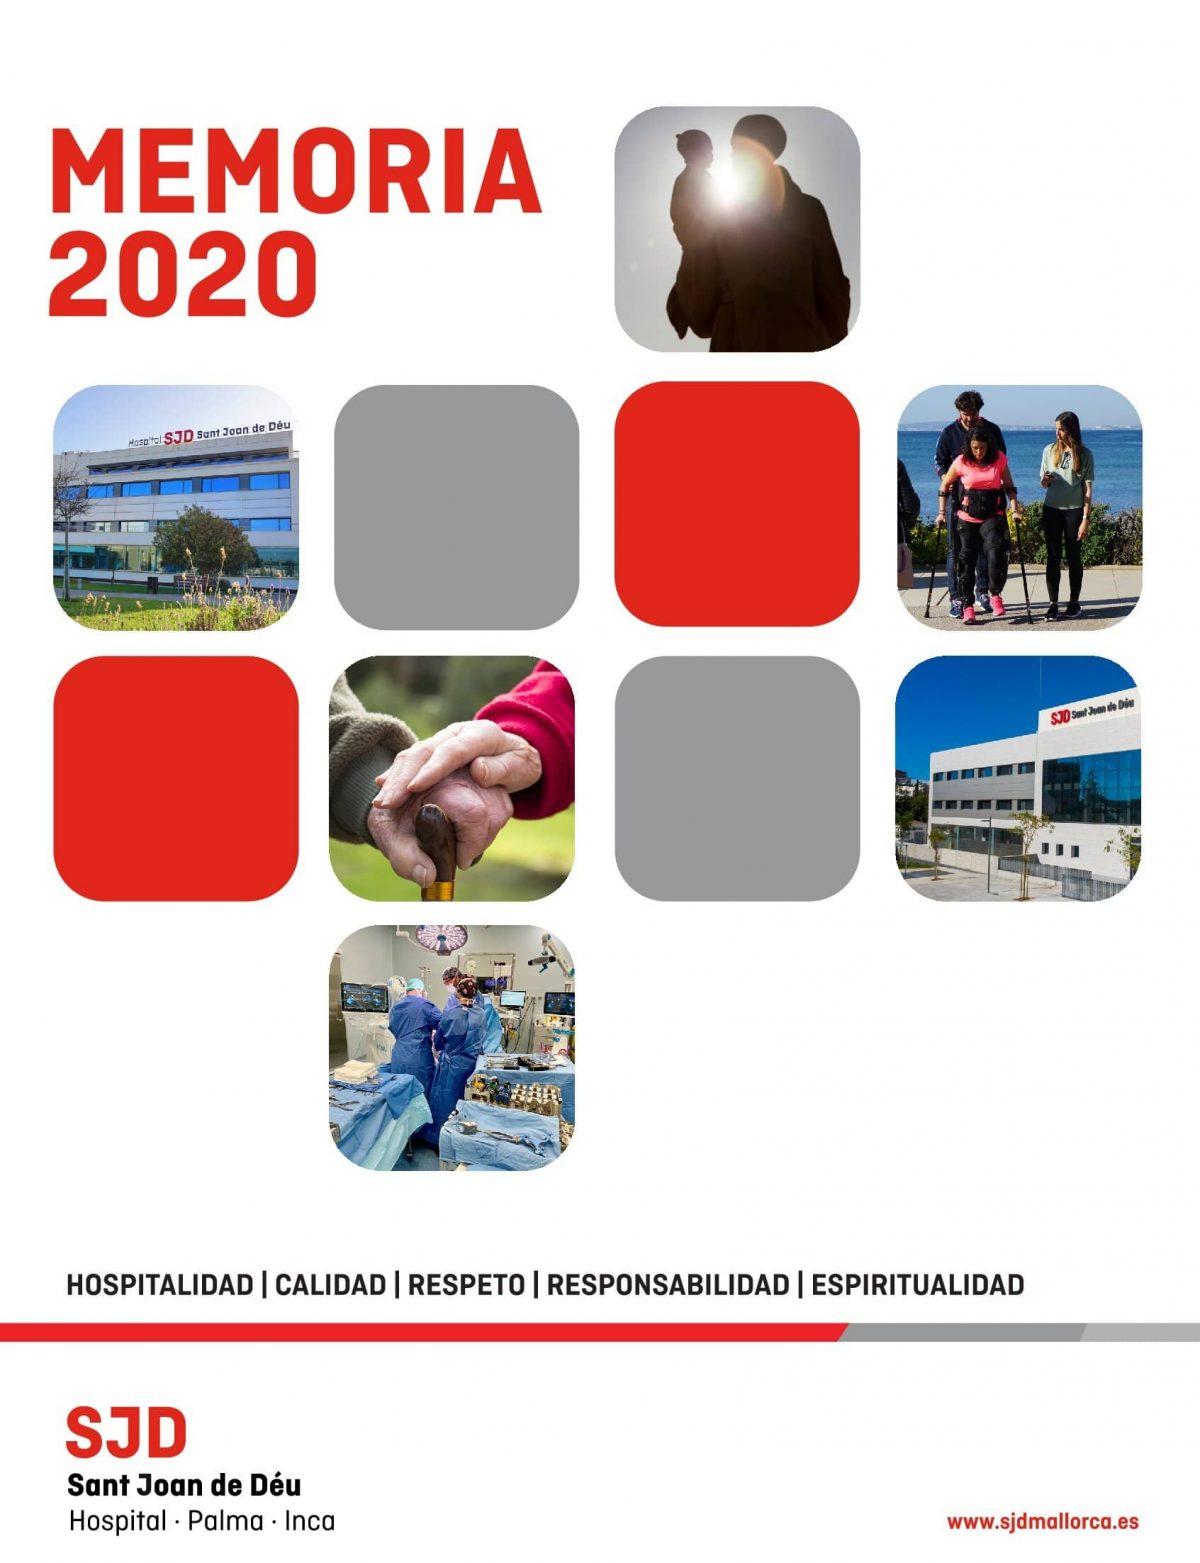 Memoria-2020-HSJD-Web_00001-1-1200x1563.jpg